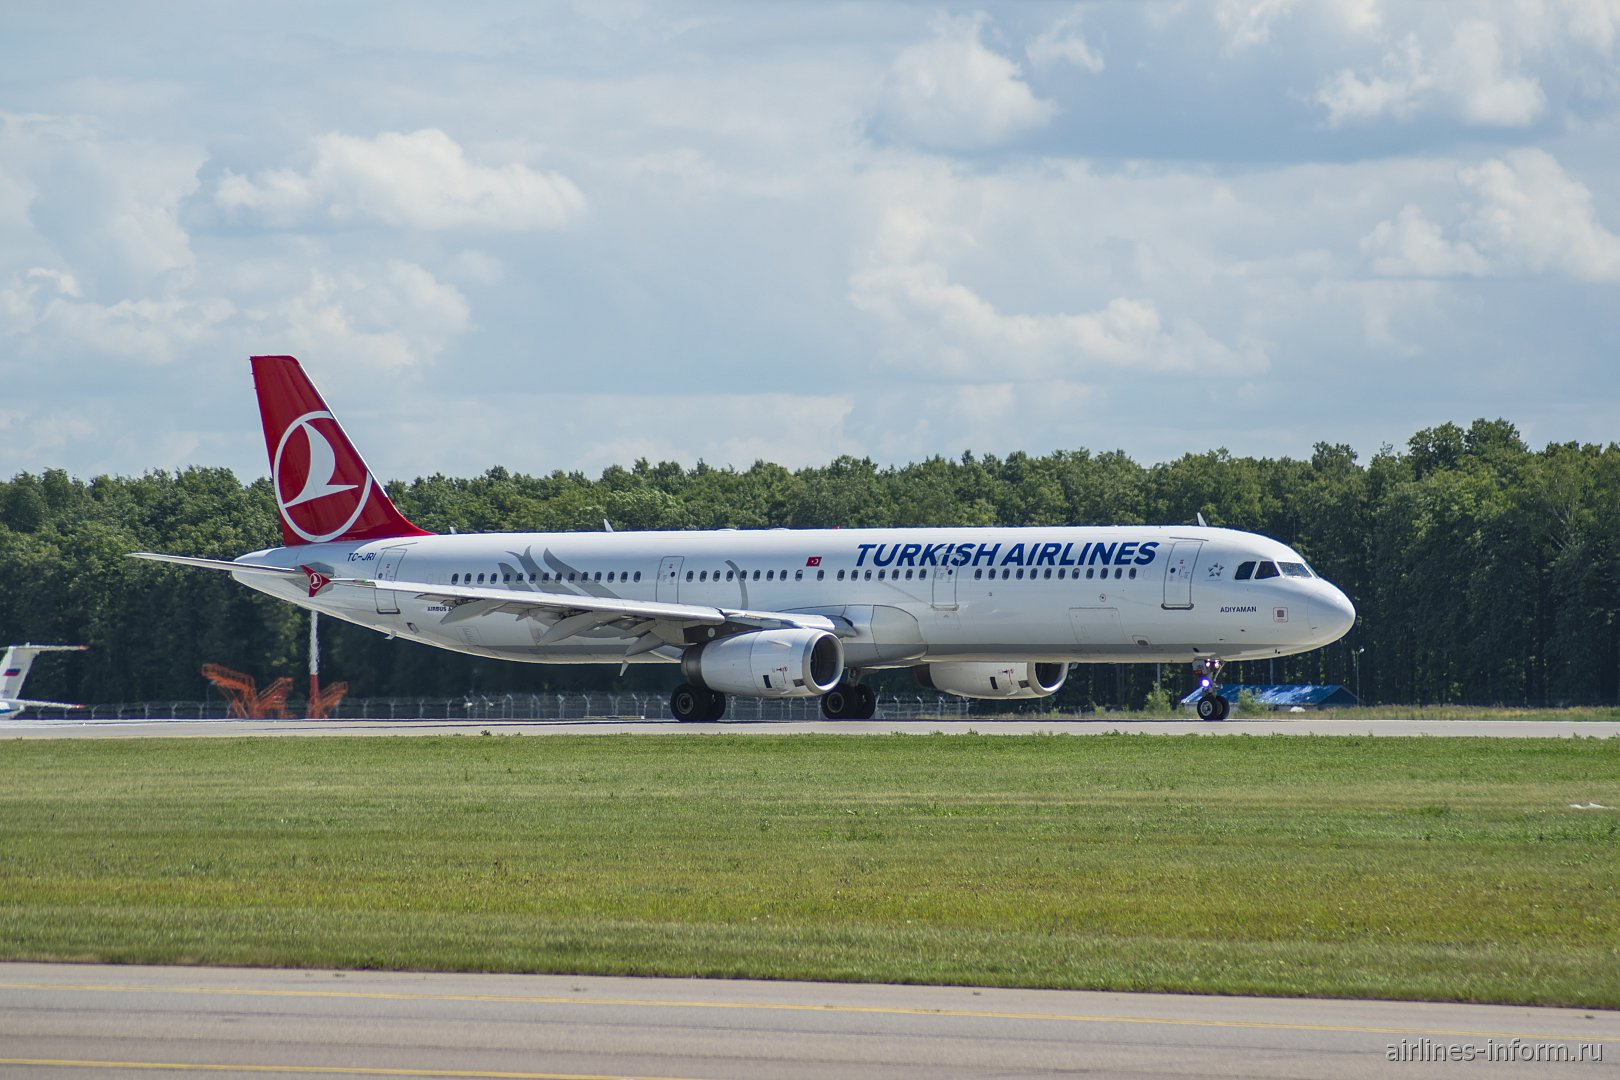 Airbus A321 Турецких авиалиний на рулежной дорожке в аэропорту Внуково